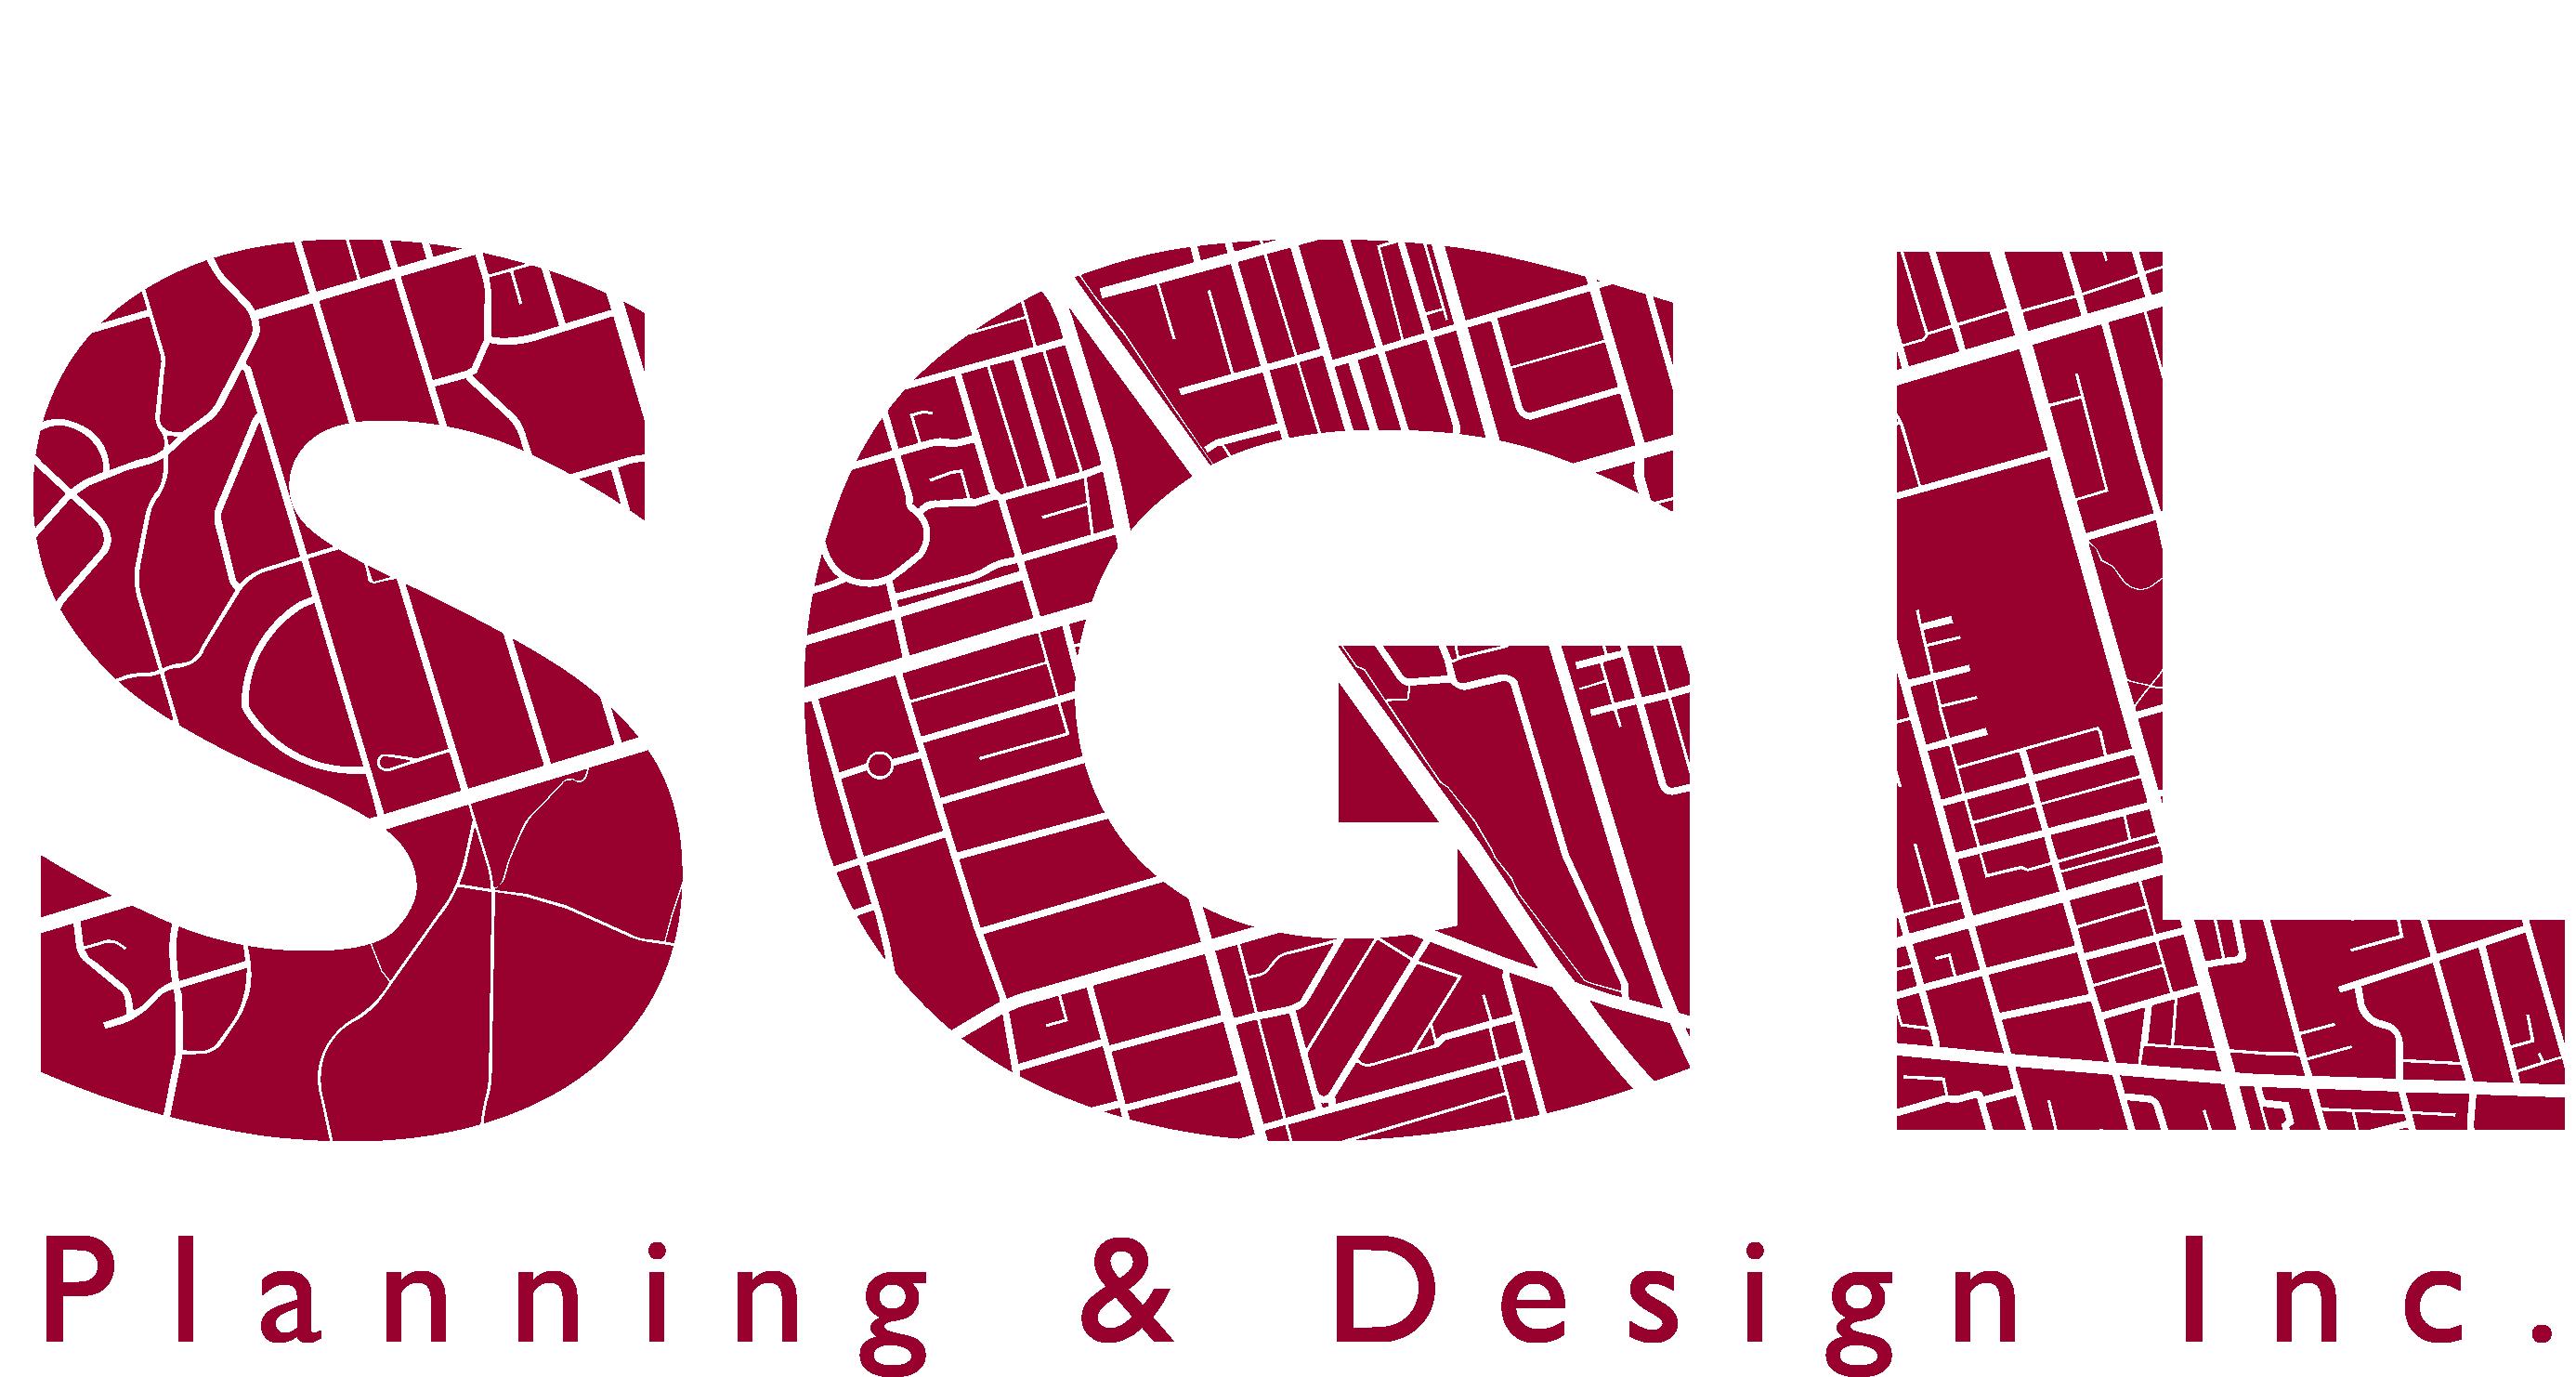 Sgl planning design inc. Environment clipart urban planner